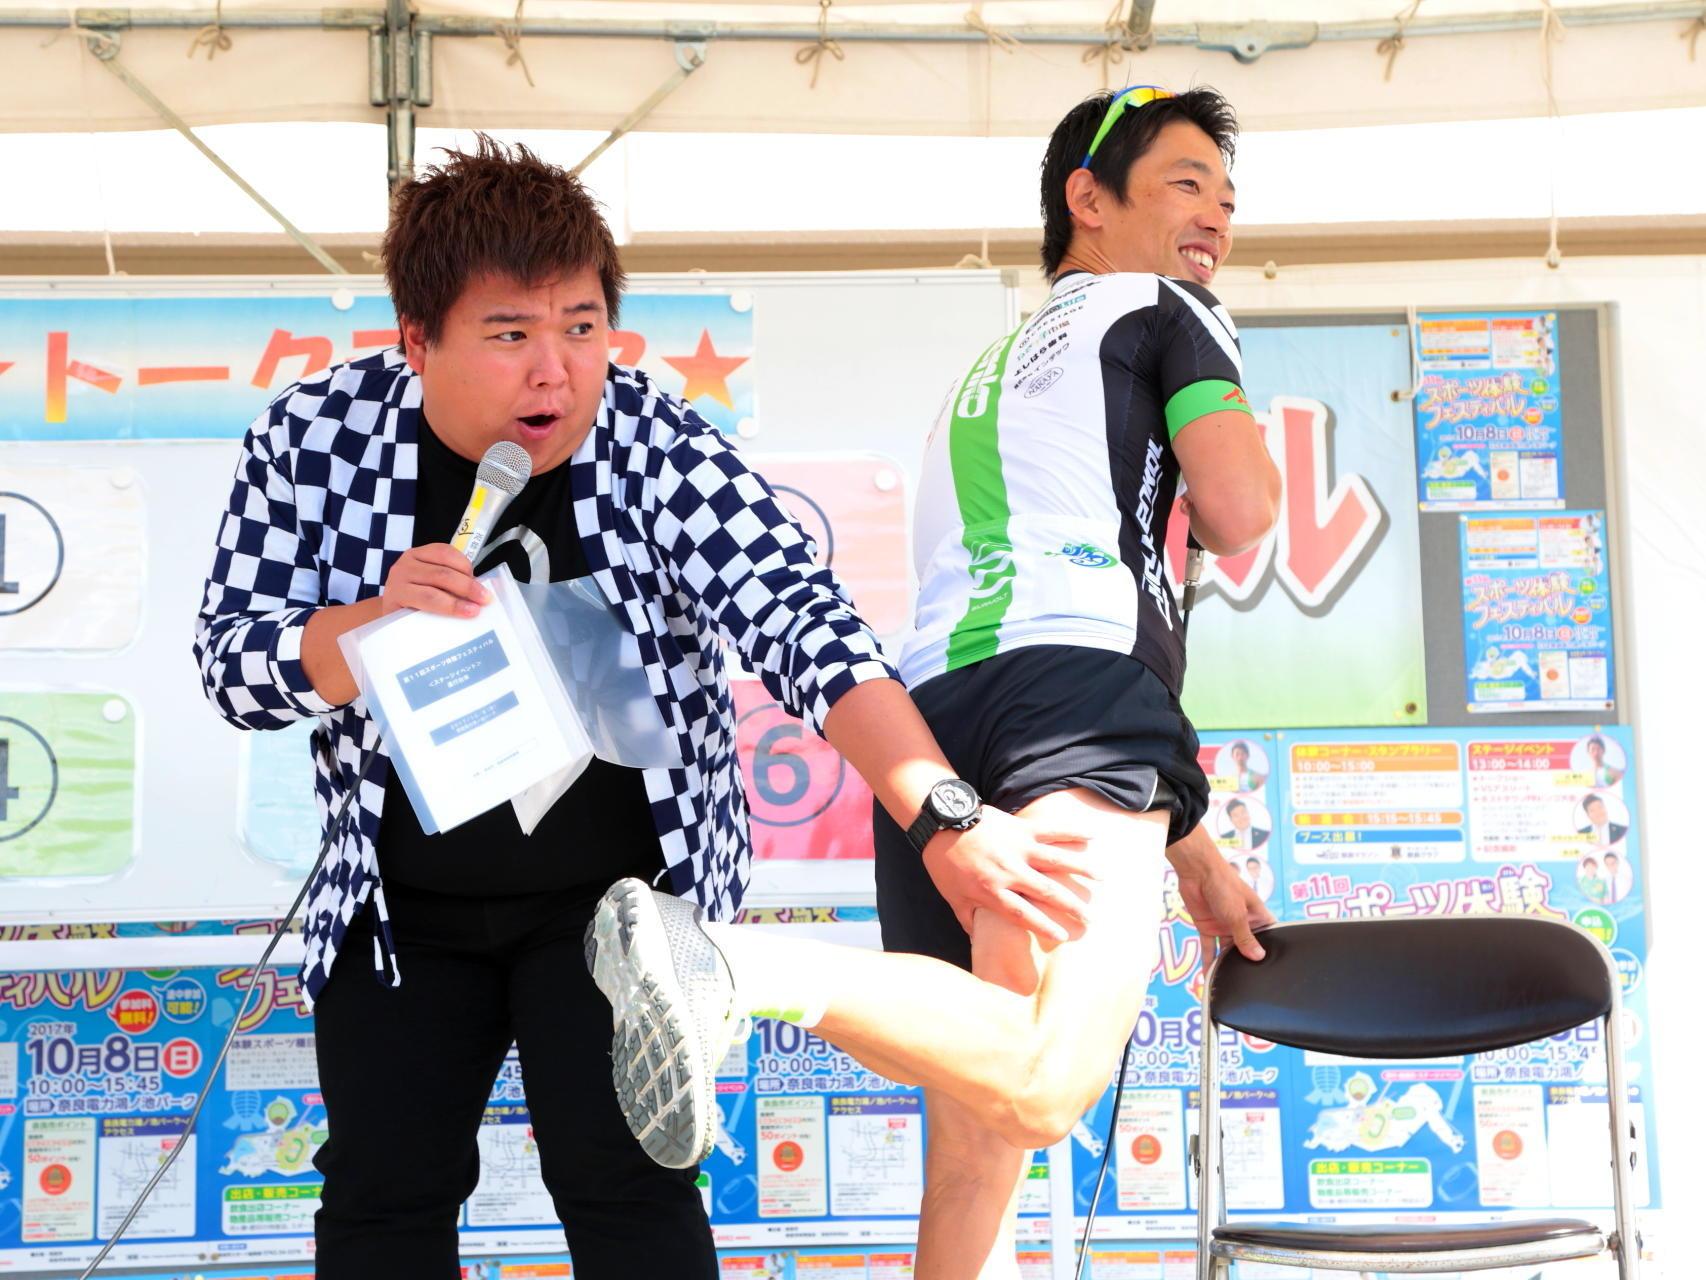 http://news.yoshimoto.co.jp/20171013012222-dcccc5d8e4e68283183cf43bd161be097a9f73ea.jpg